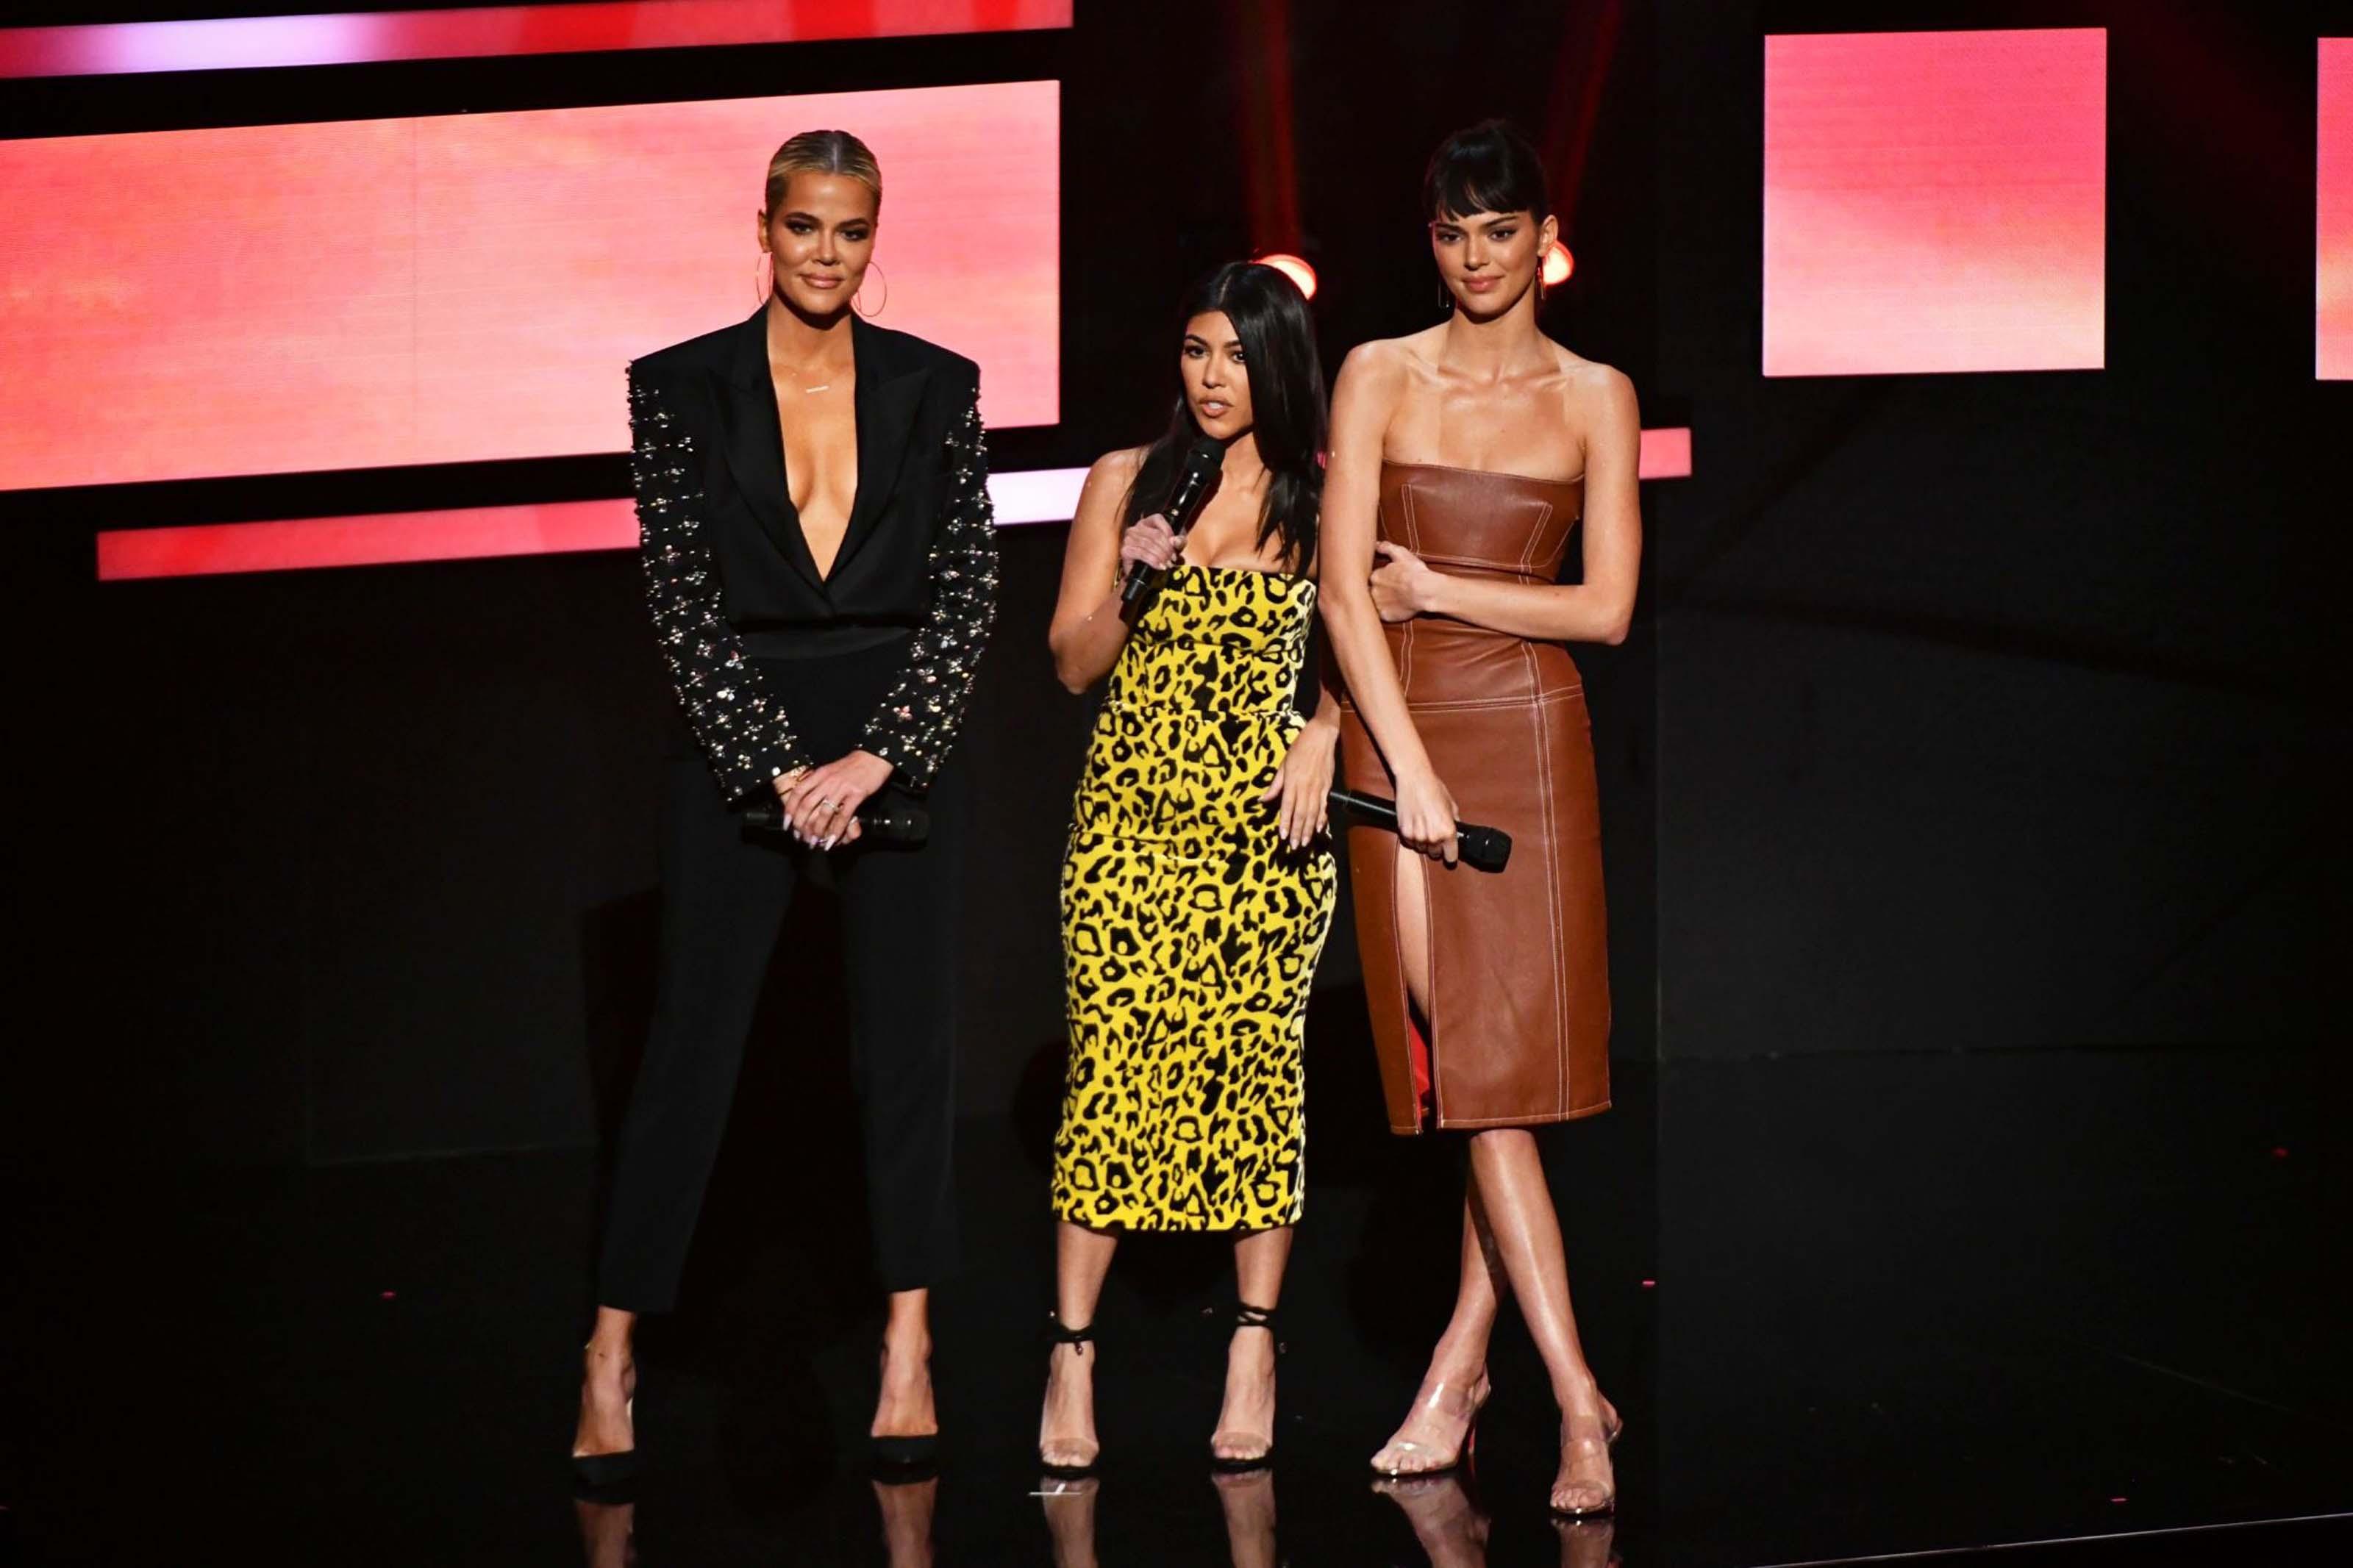 Kendall Jenner attends NBCUniversal Upfront Presentation